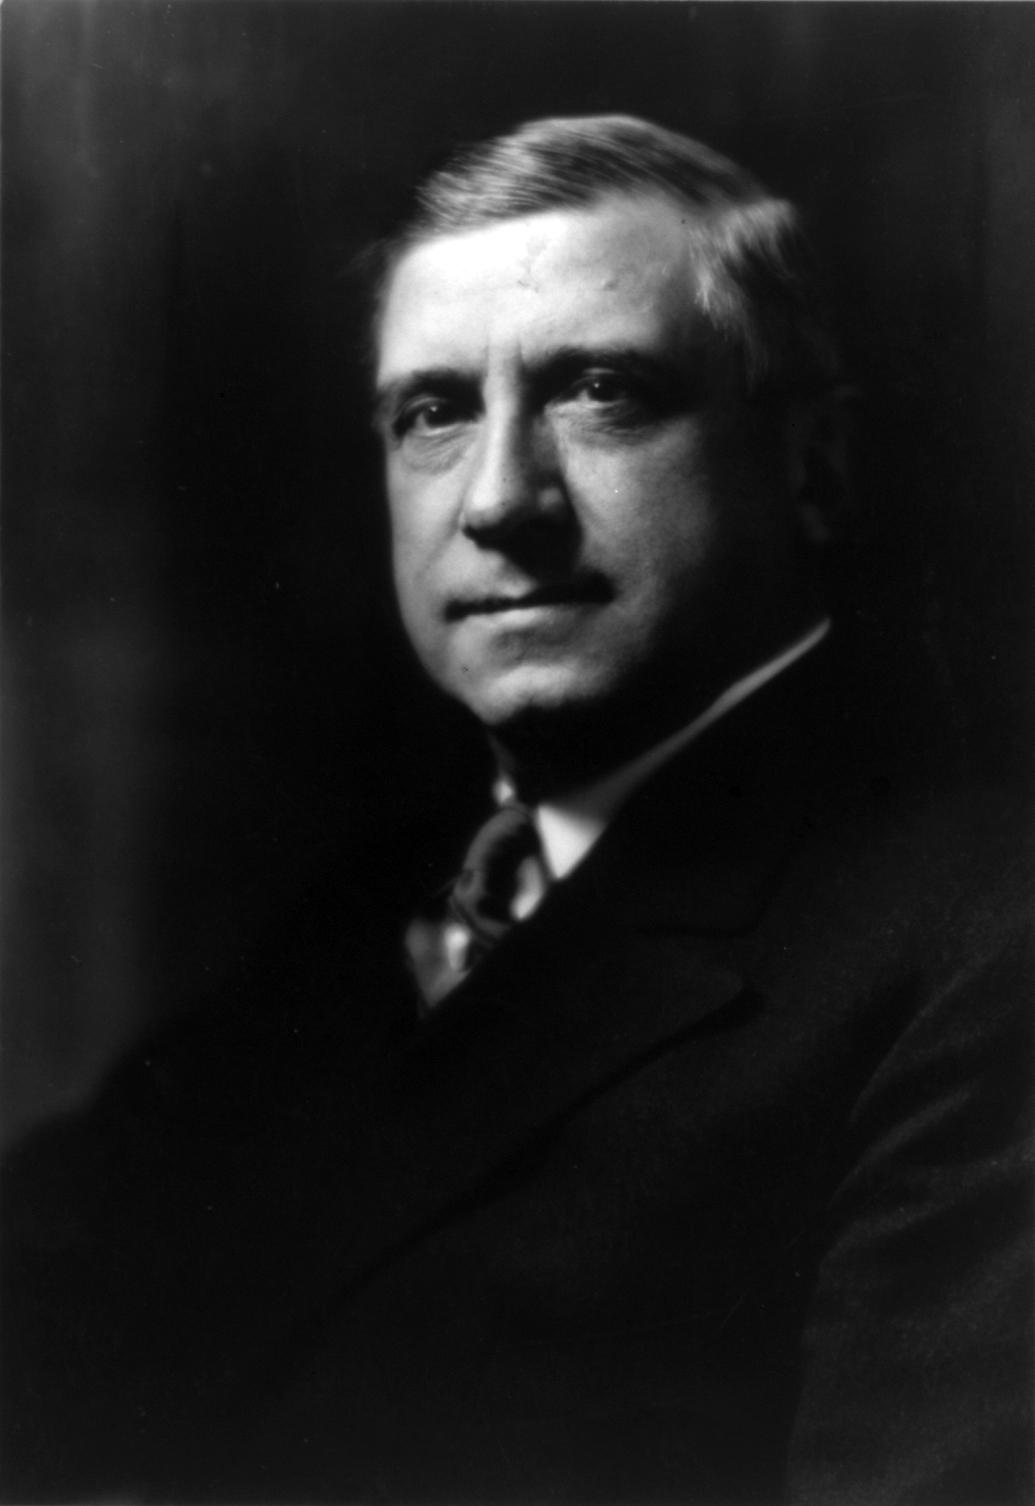 Charles M Schwab Wikipedia